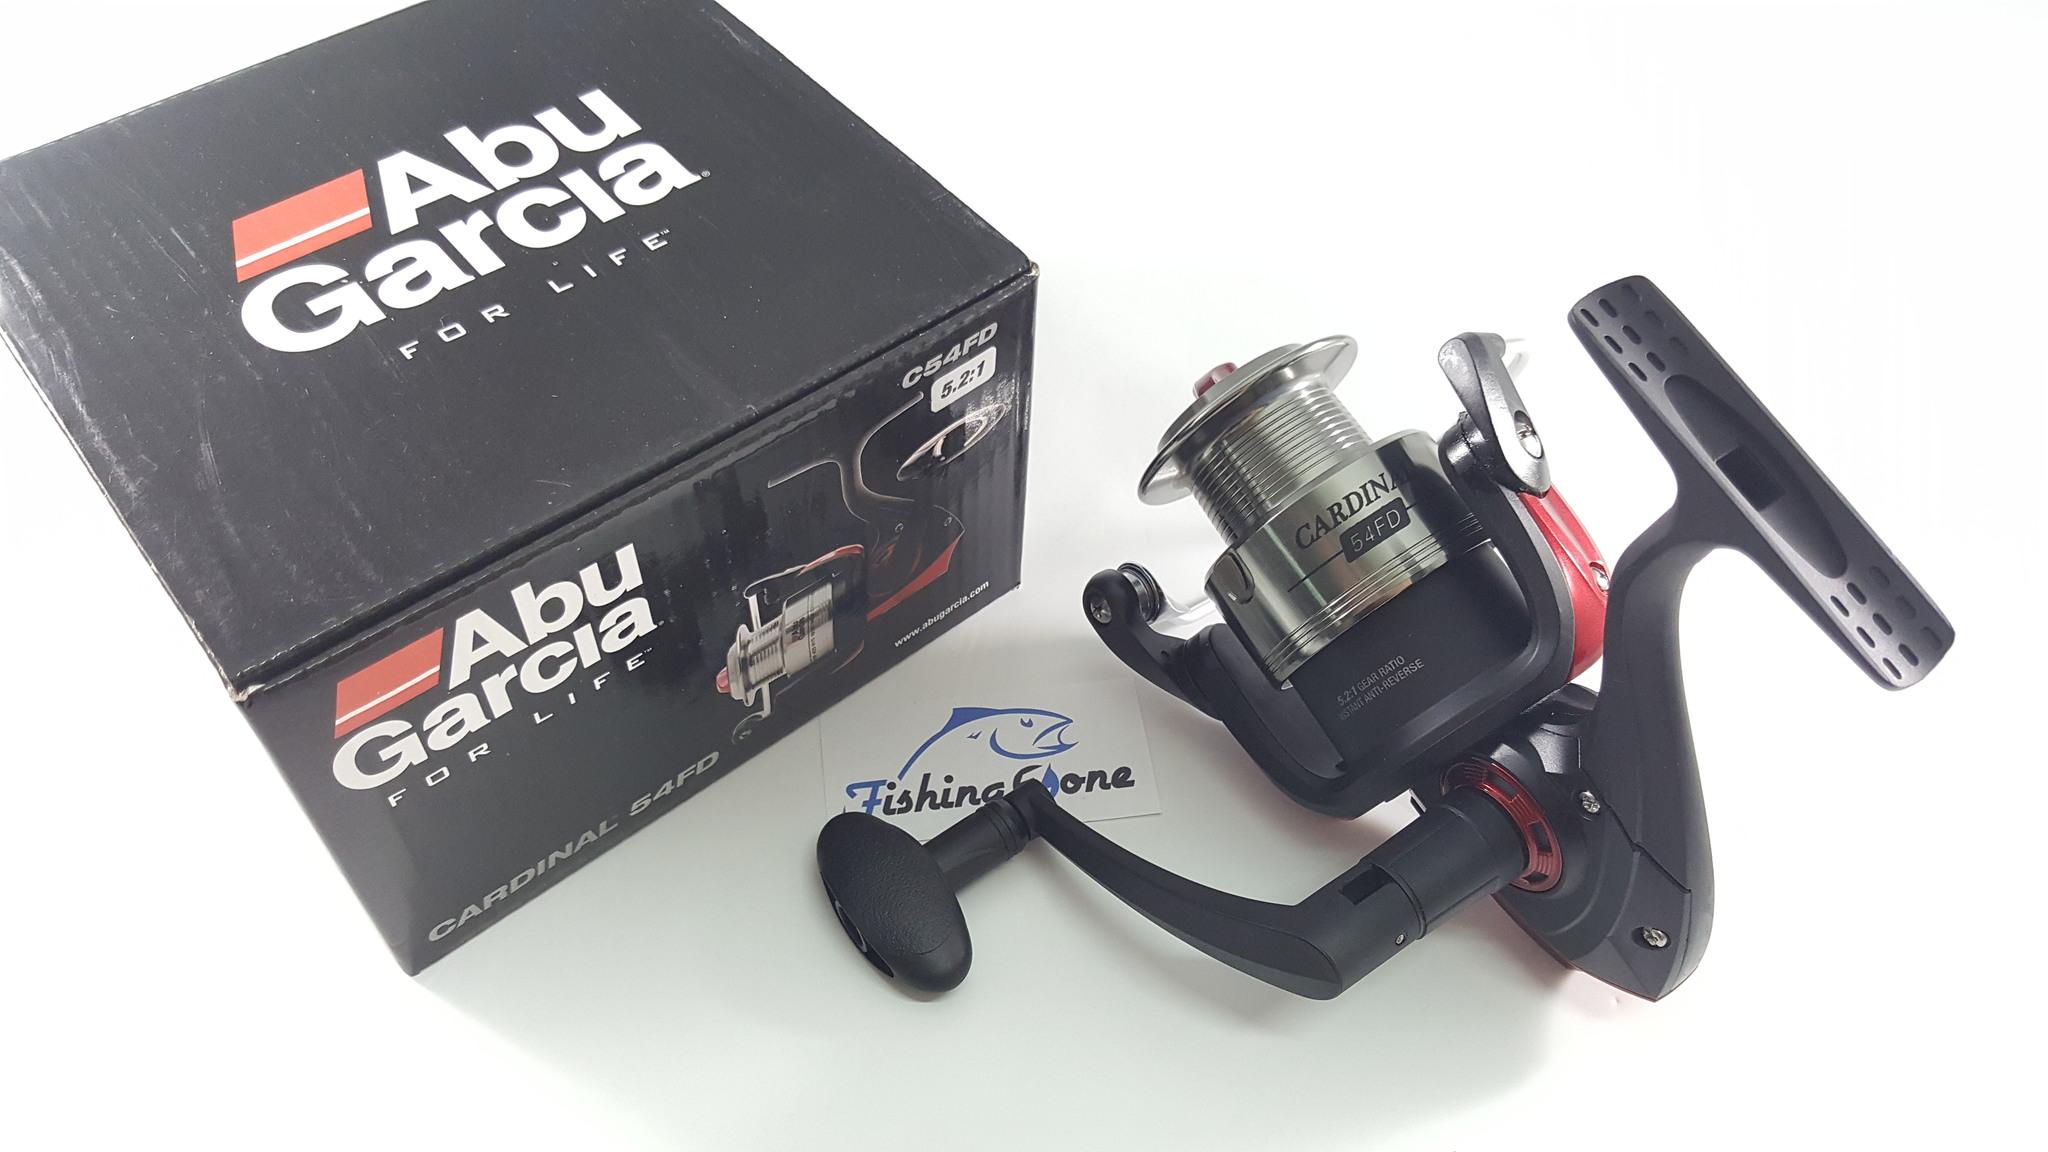 harga Alat Pancing Abu Garcia Cardinal 54 Fd Spinning Reel - 4000 Blanja.com